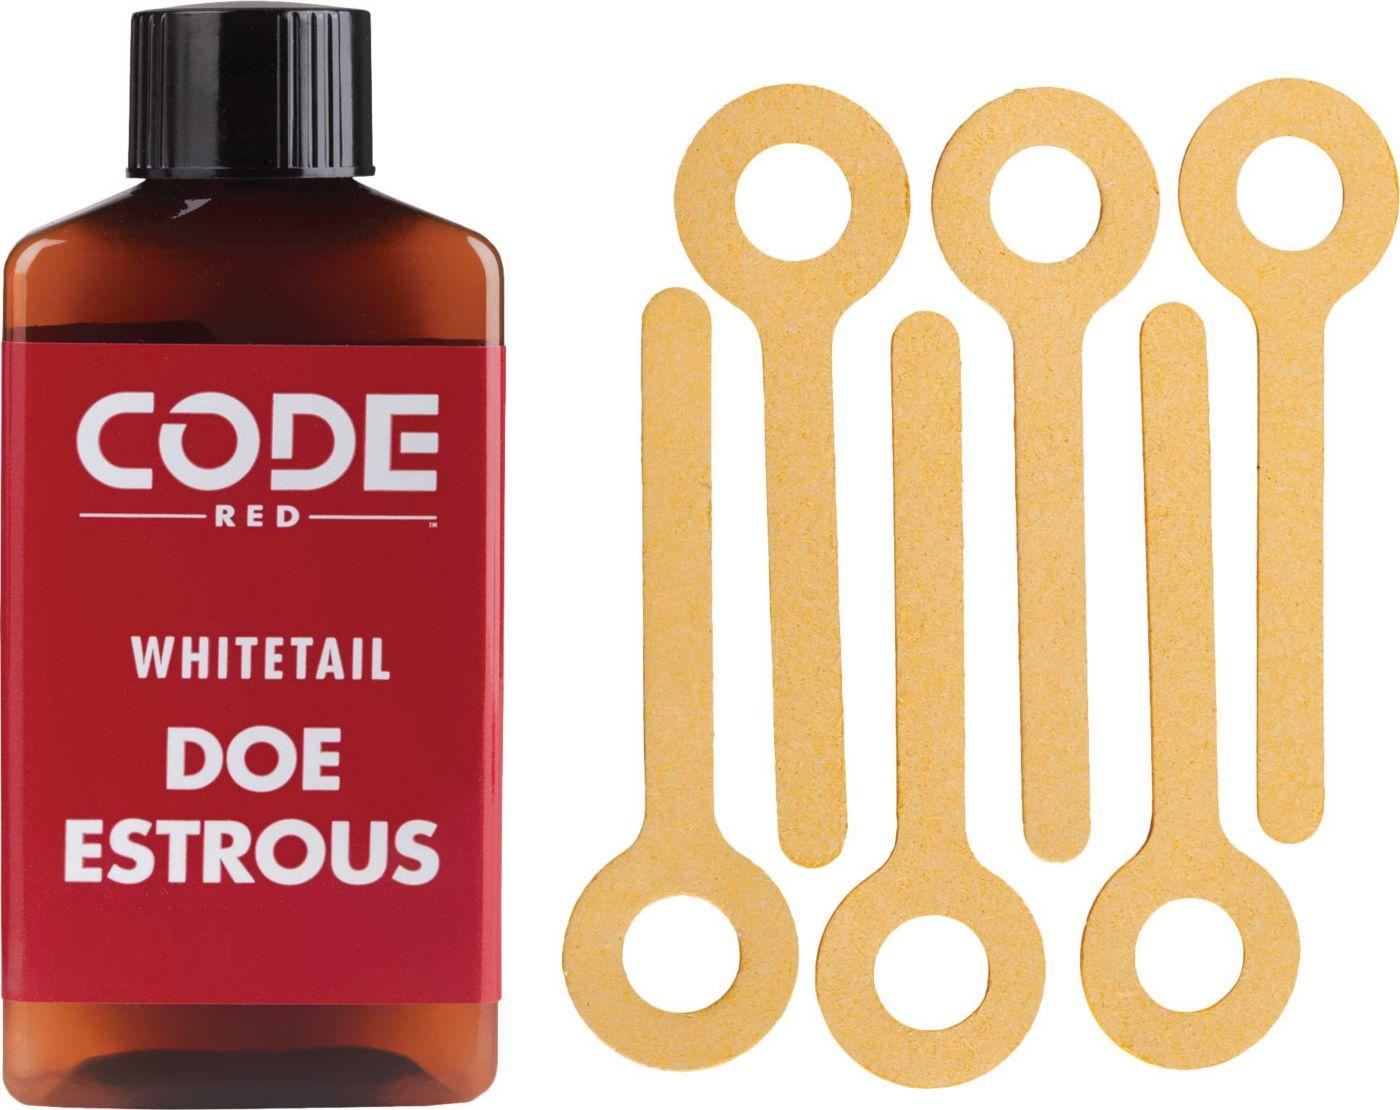 Code Blue Code Red Doe Estrous Kit